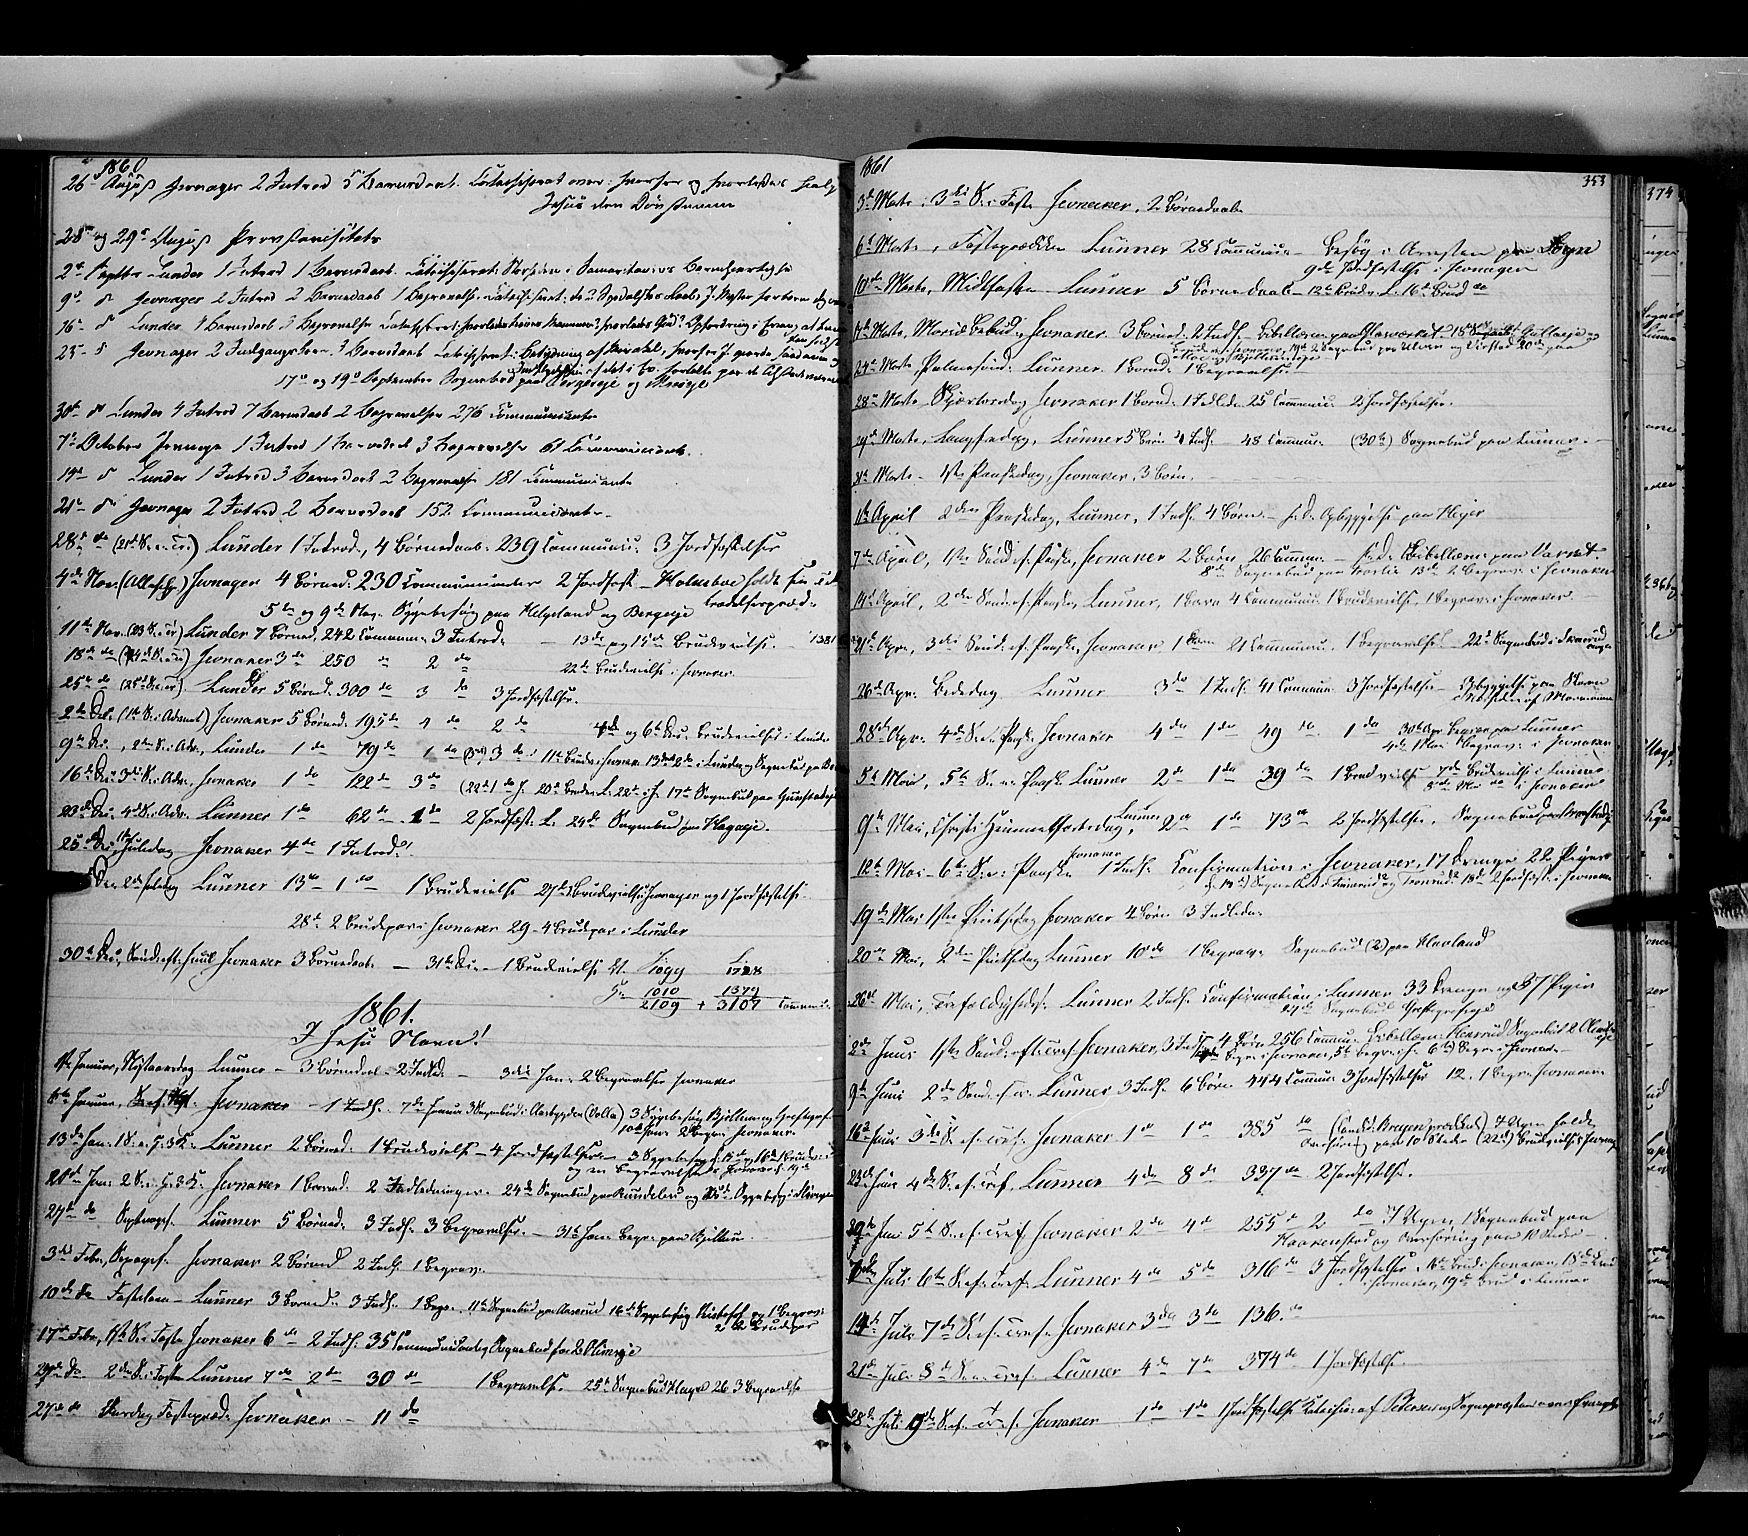 SAH, Jevnaker prestekontor, Ministerialbok nr. 7, 1858-1876, s. 353